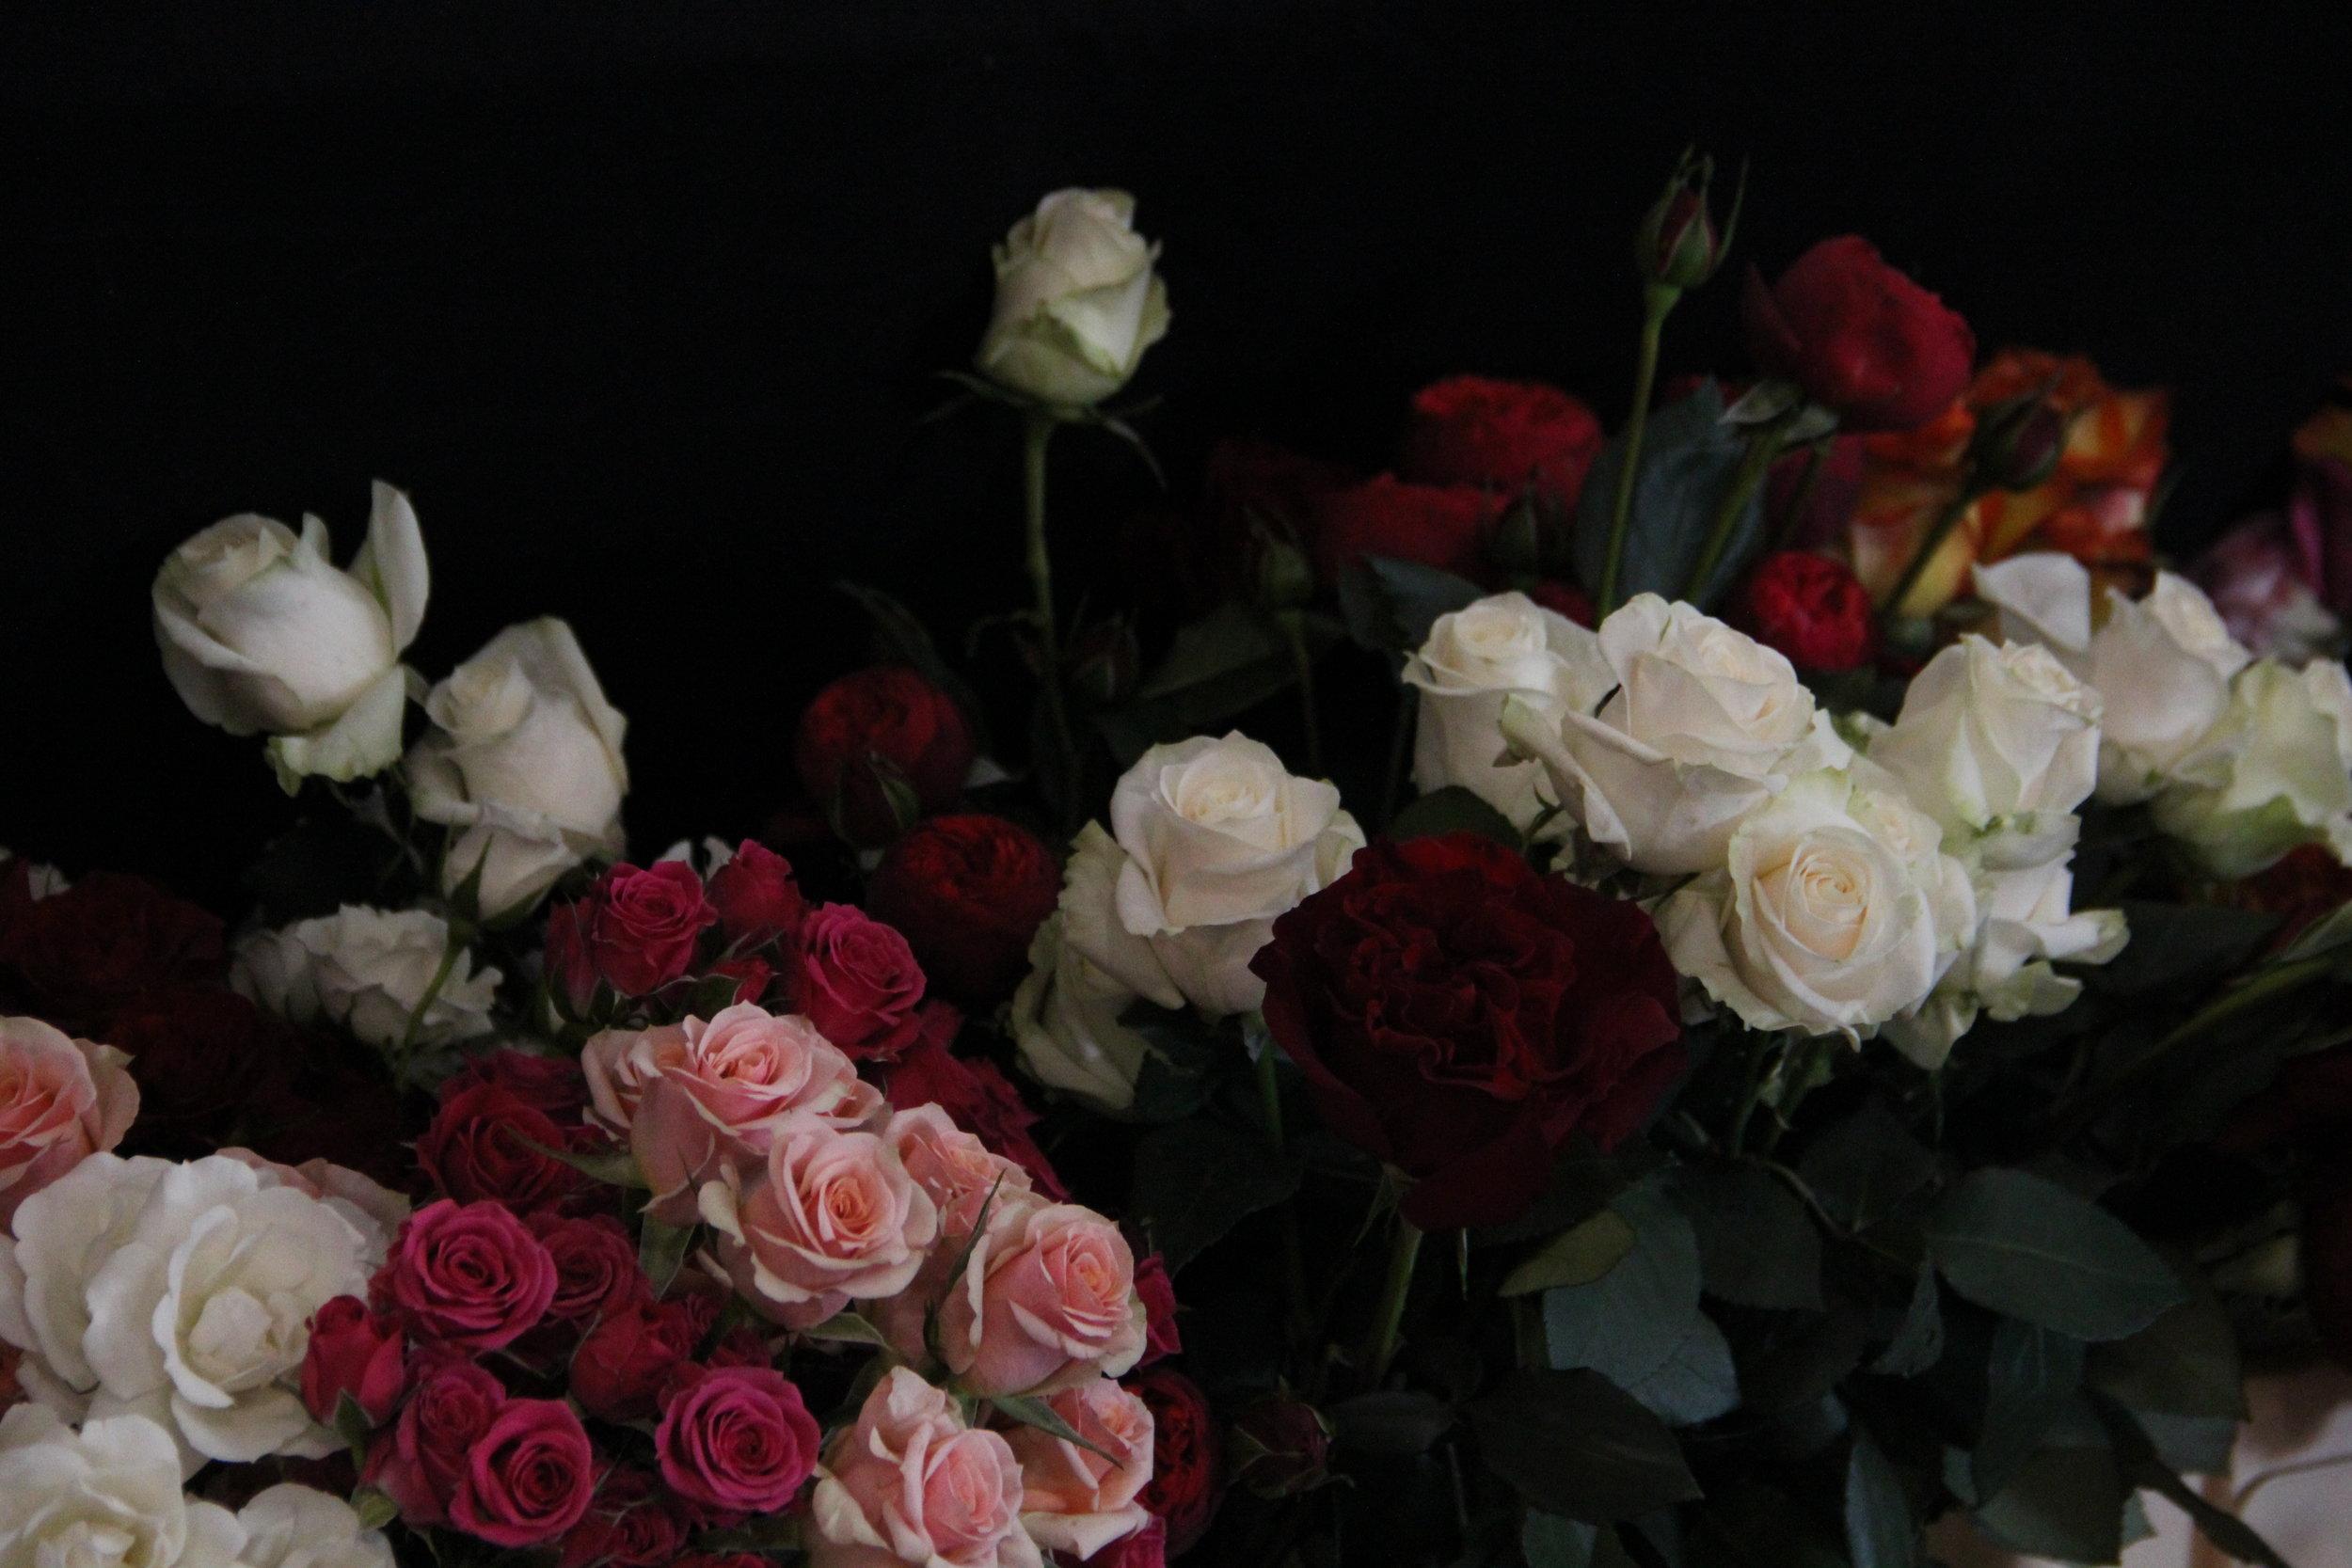 Cut flower Rose cultivars